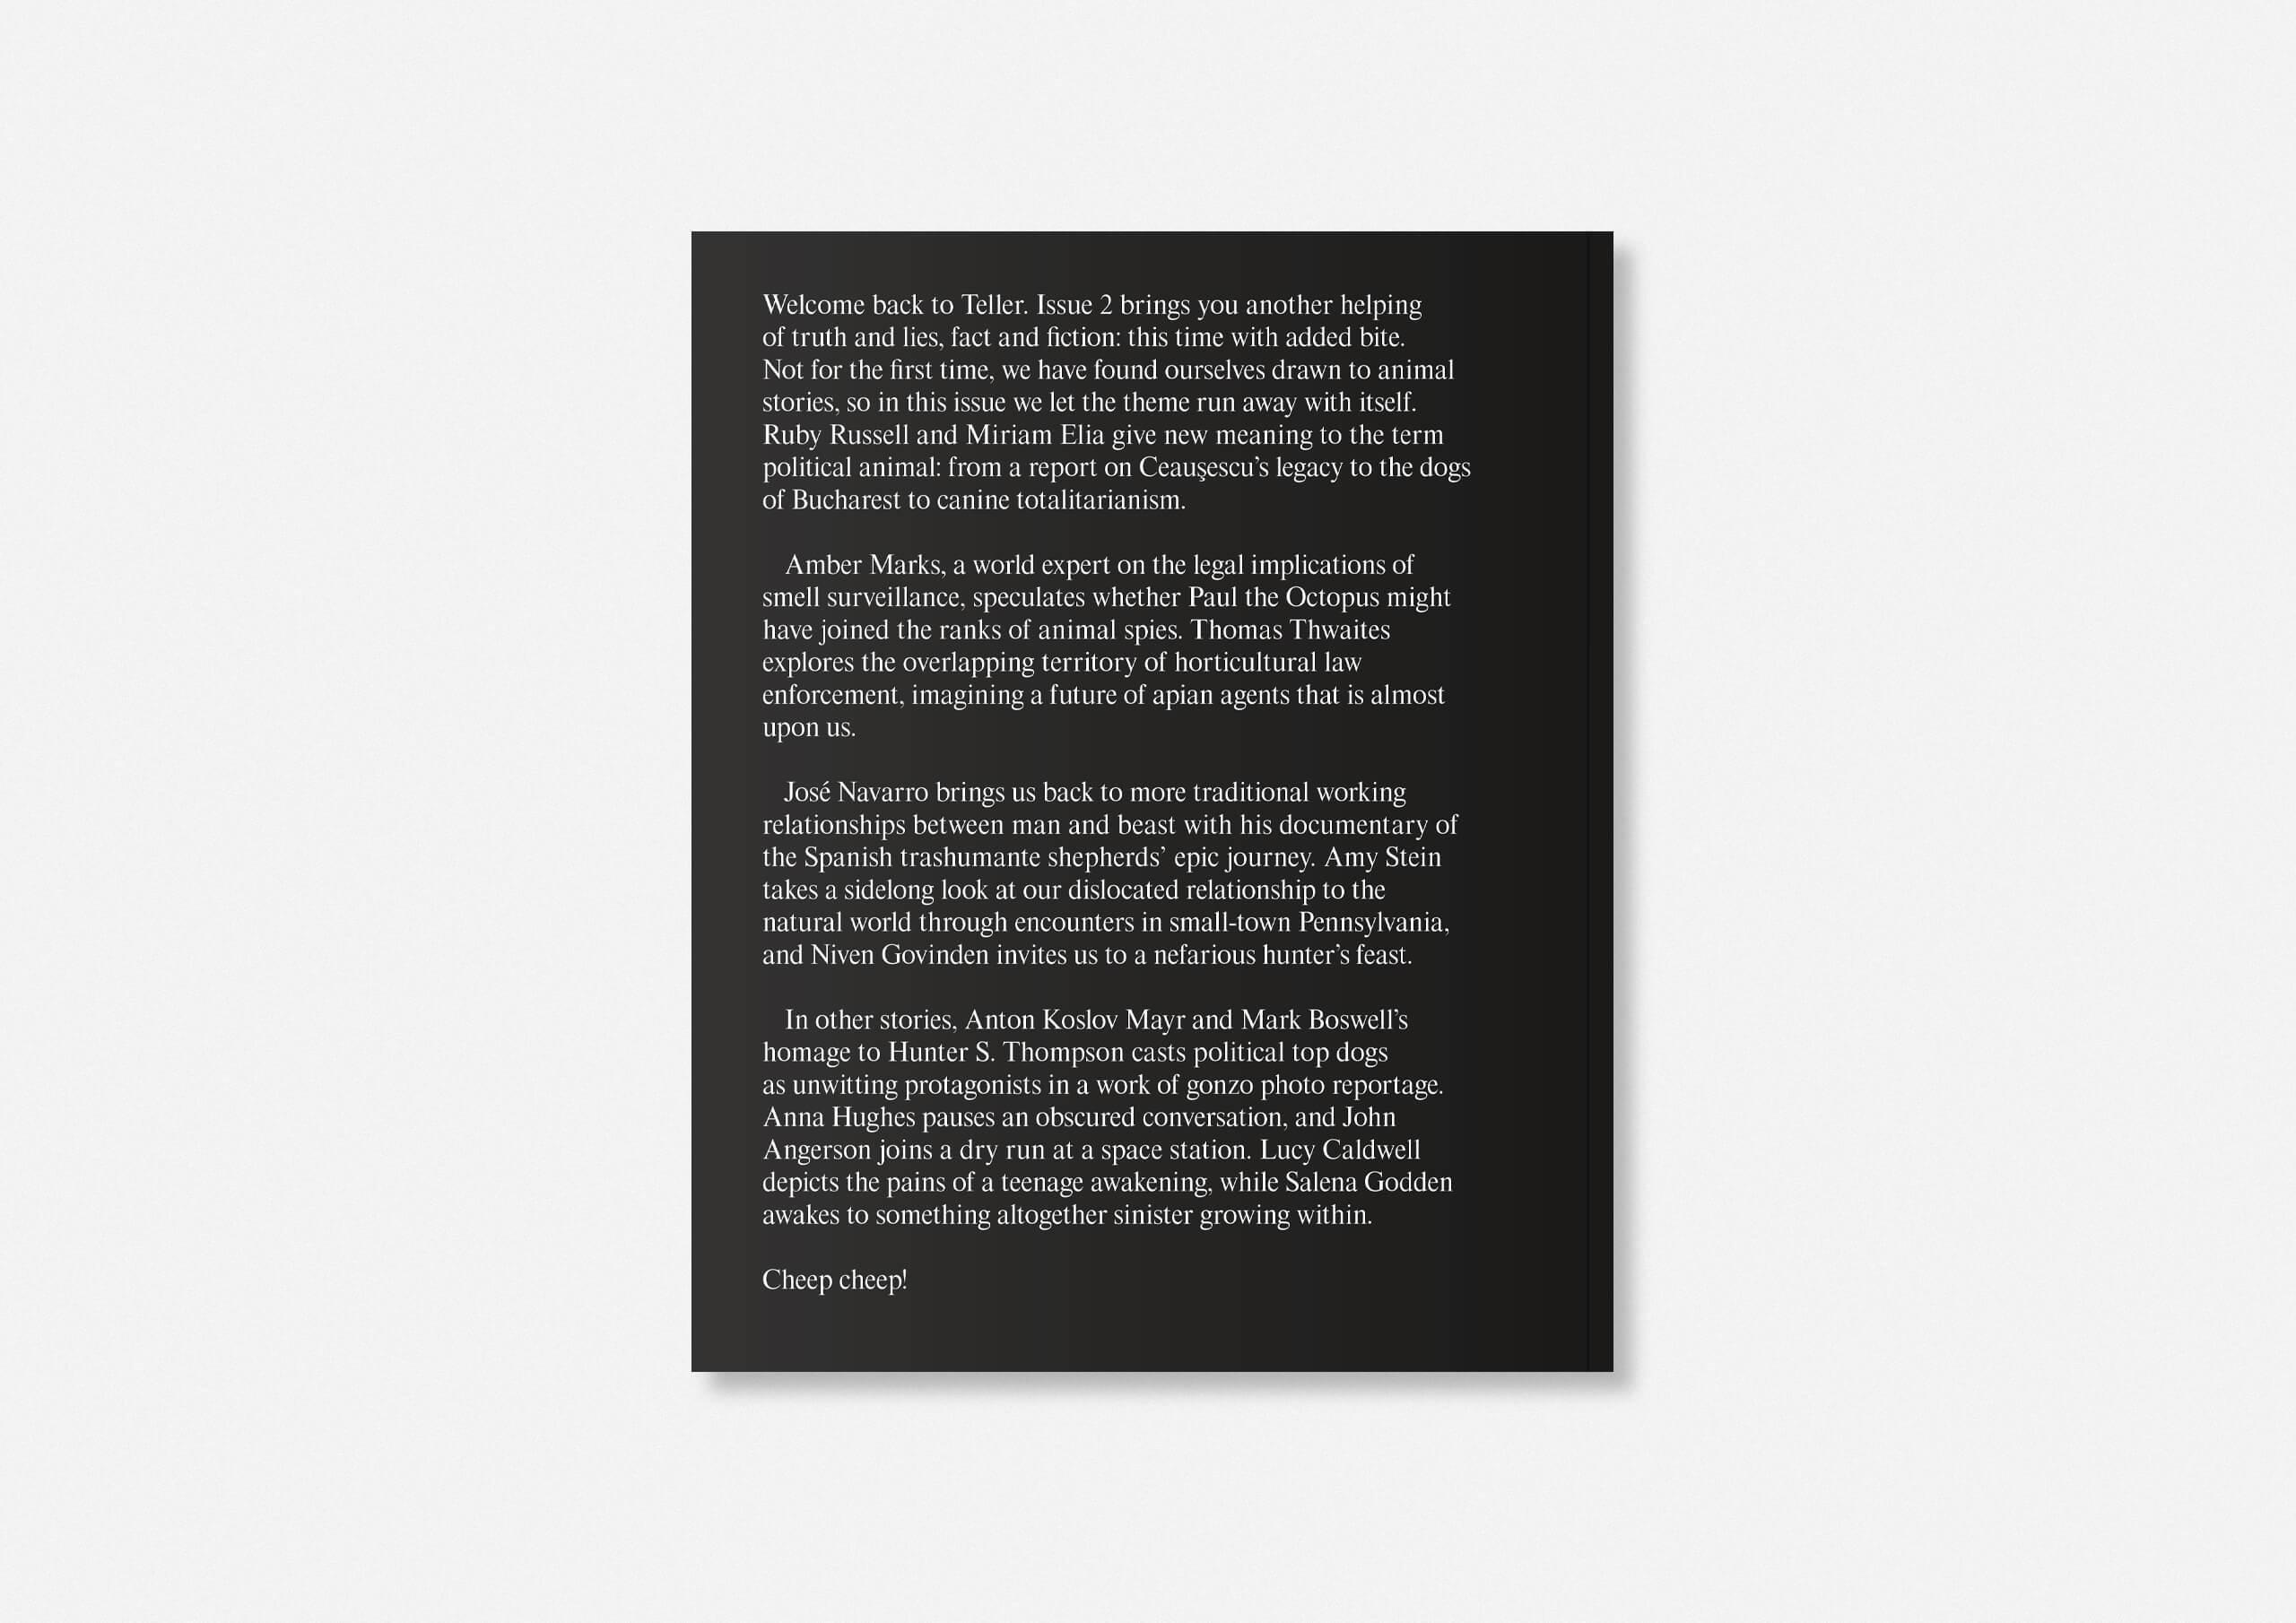 https://neuegestaltung.de/media/pages/clients/teller-magazine-issue-2/83227ccf9d-1597415081/teller_issue_02_ruckseite_ng.jpg